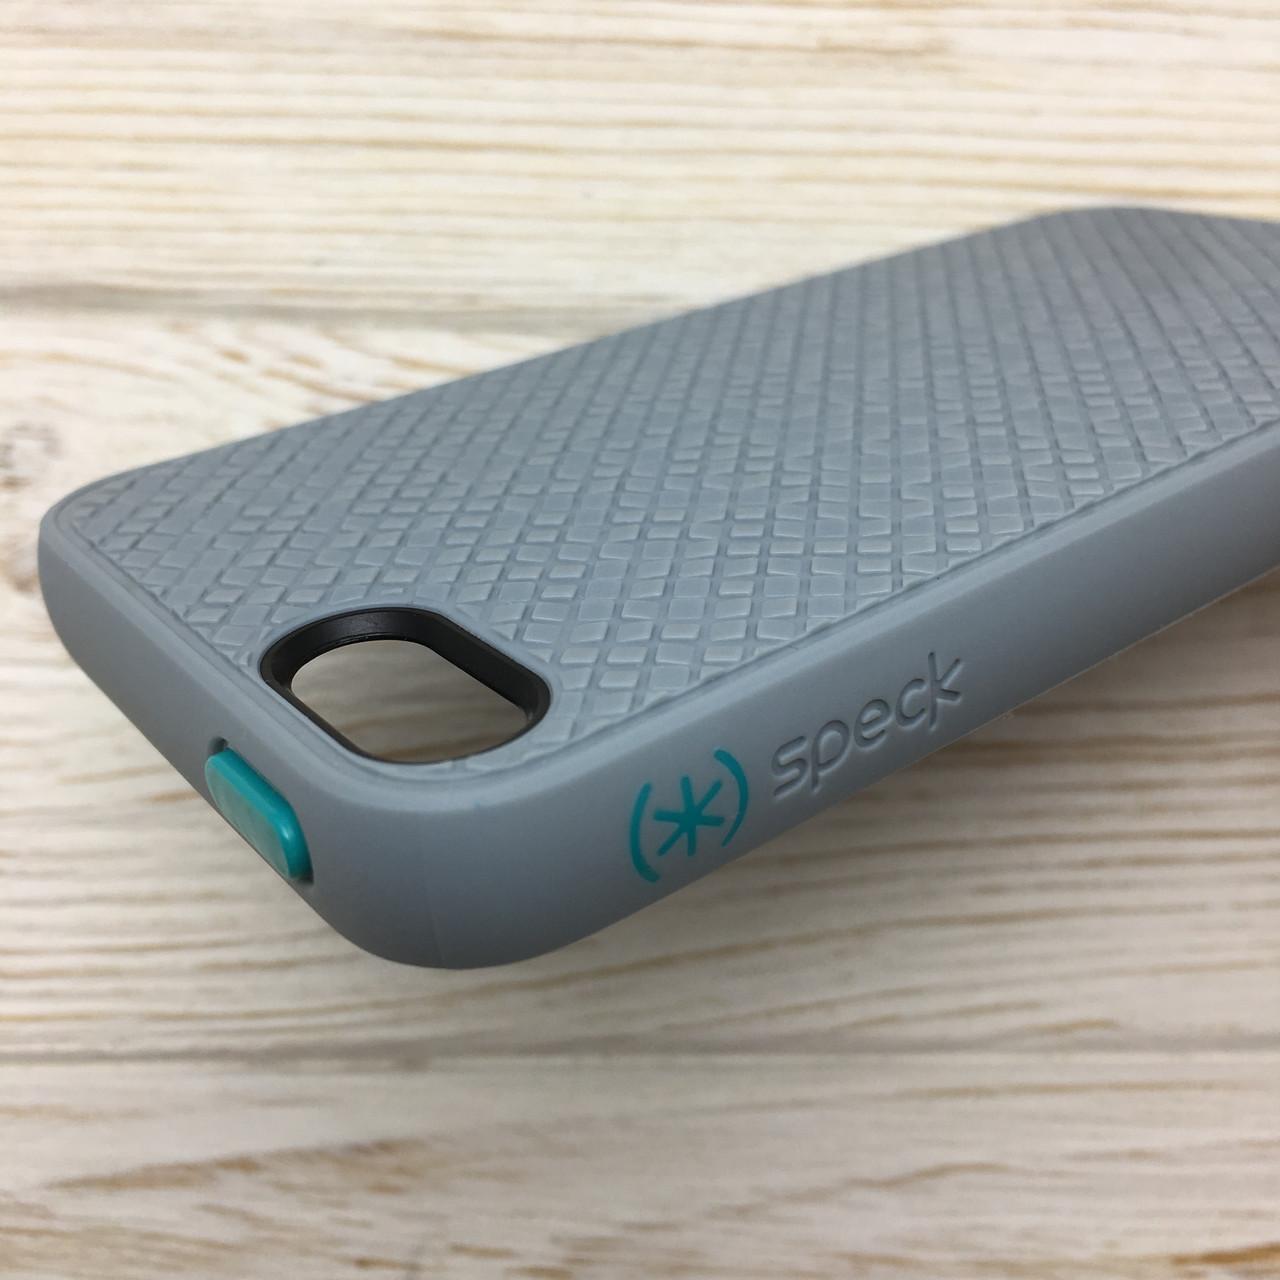 best website 65d58 7bd31 Чехол Speck SmartFlex SPK-A2004 Gray для Iphone 5/5s/SE